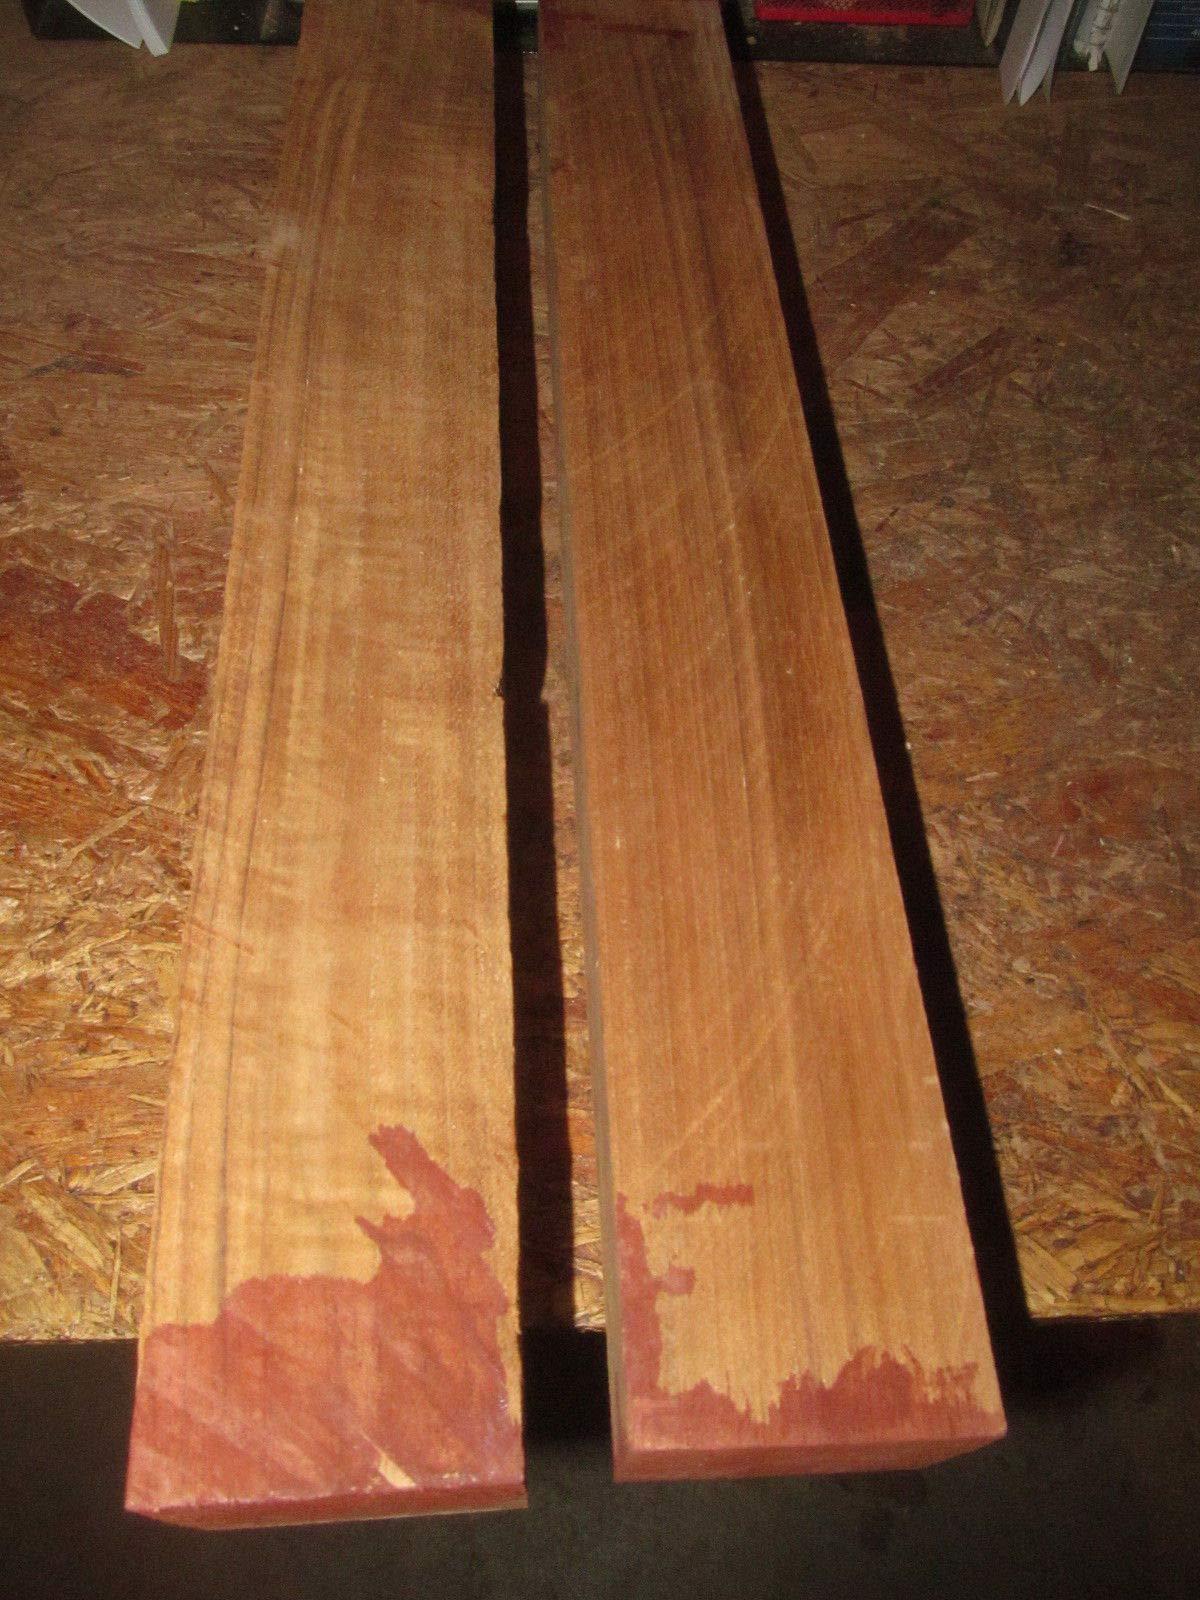 Two (2) FEQ Teak Turning Blank Lathe Block Carve Wood Lumber 2 1/2 X 2 1/2 X 19'' by Lotus energy (Image #1)